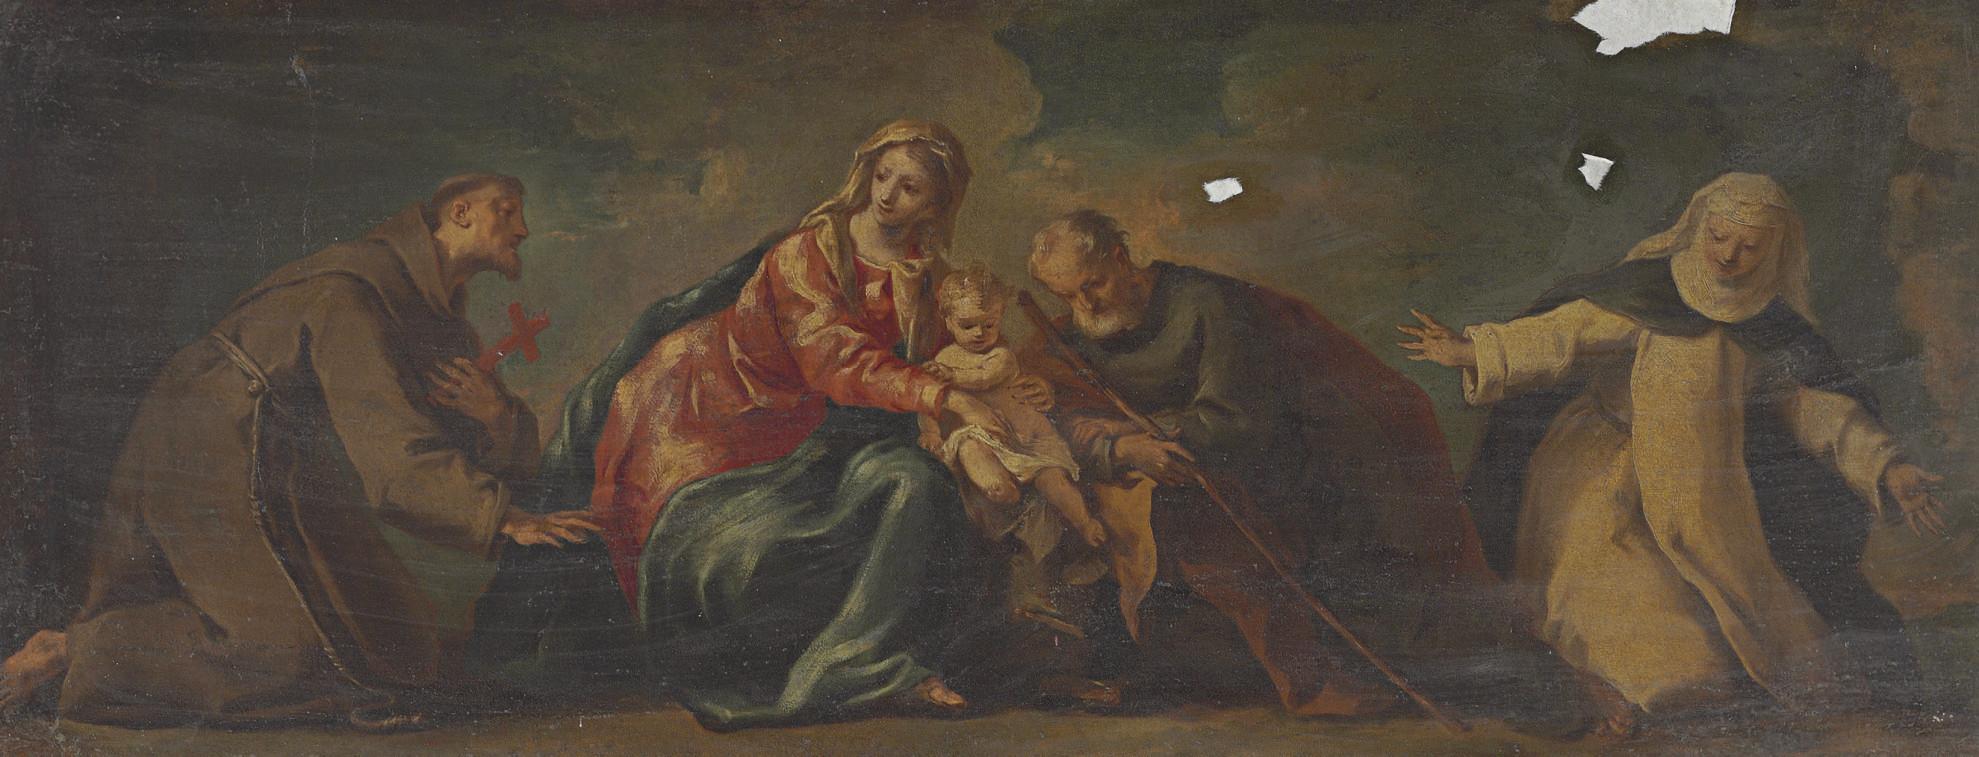 Nicola Grassi Formea 1682-c. 1750 Venice